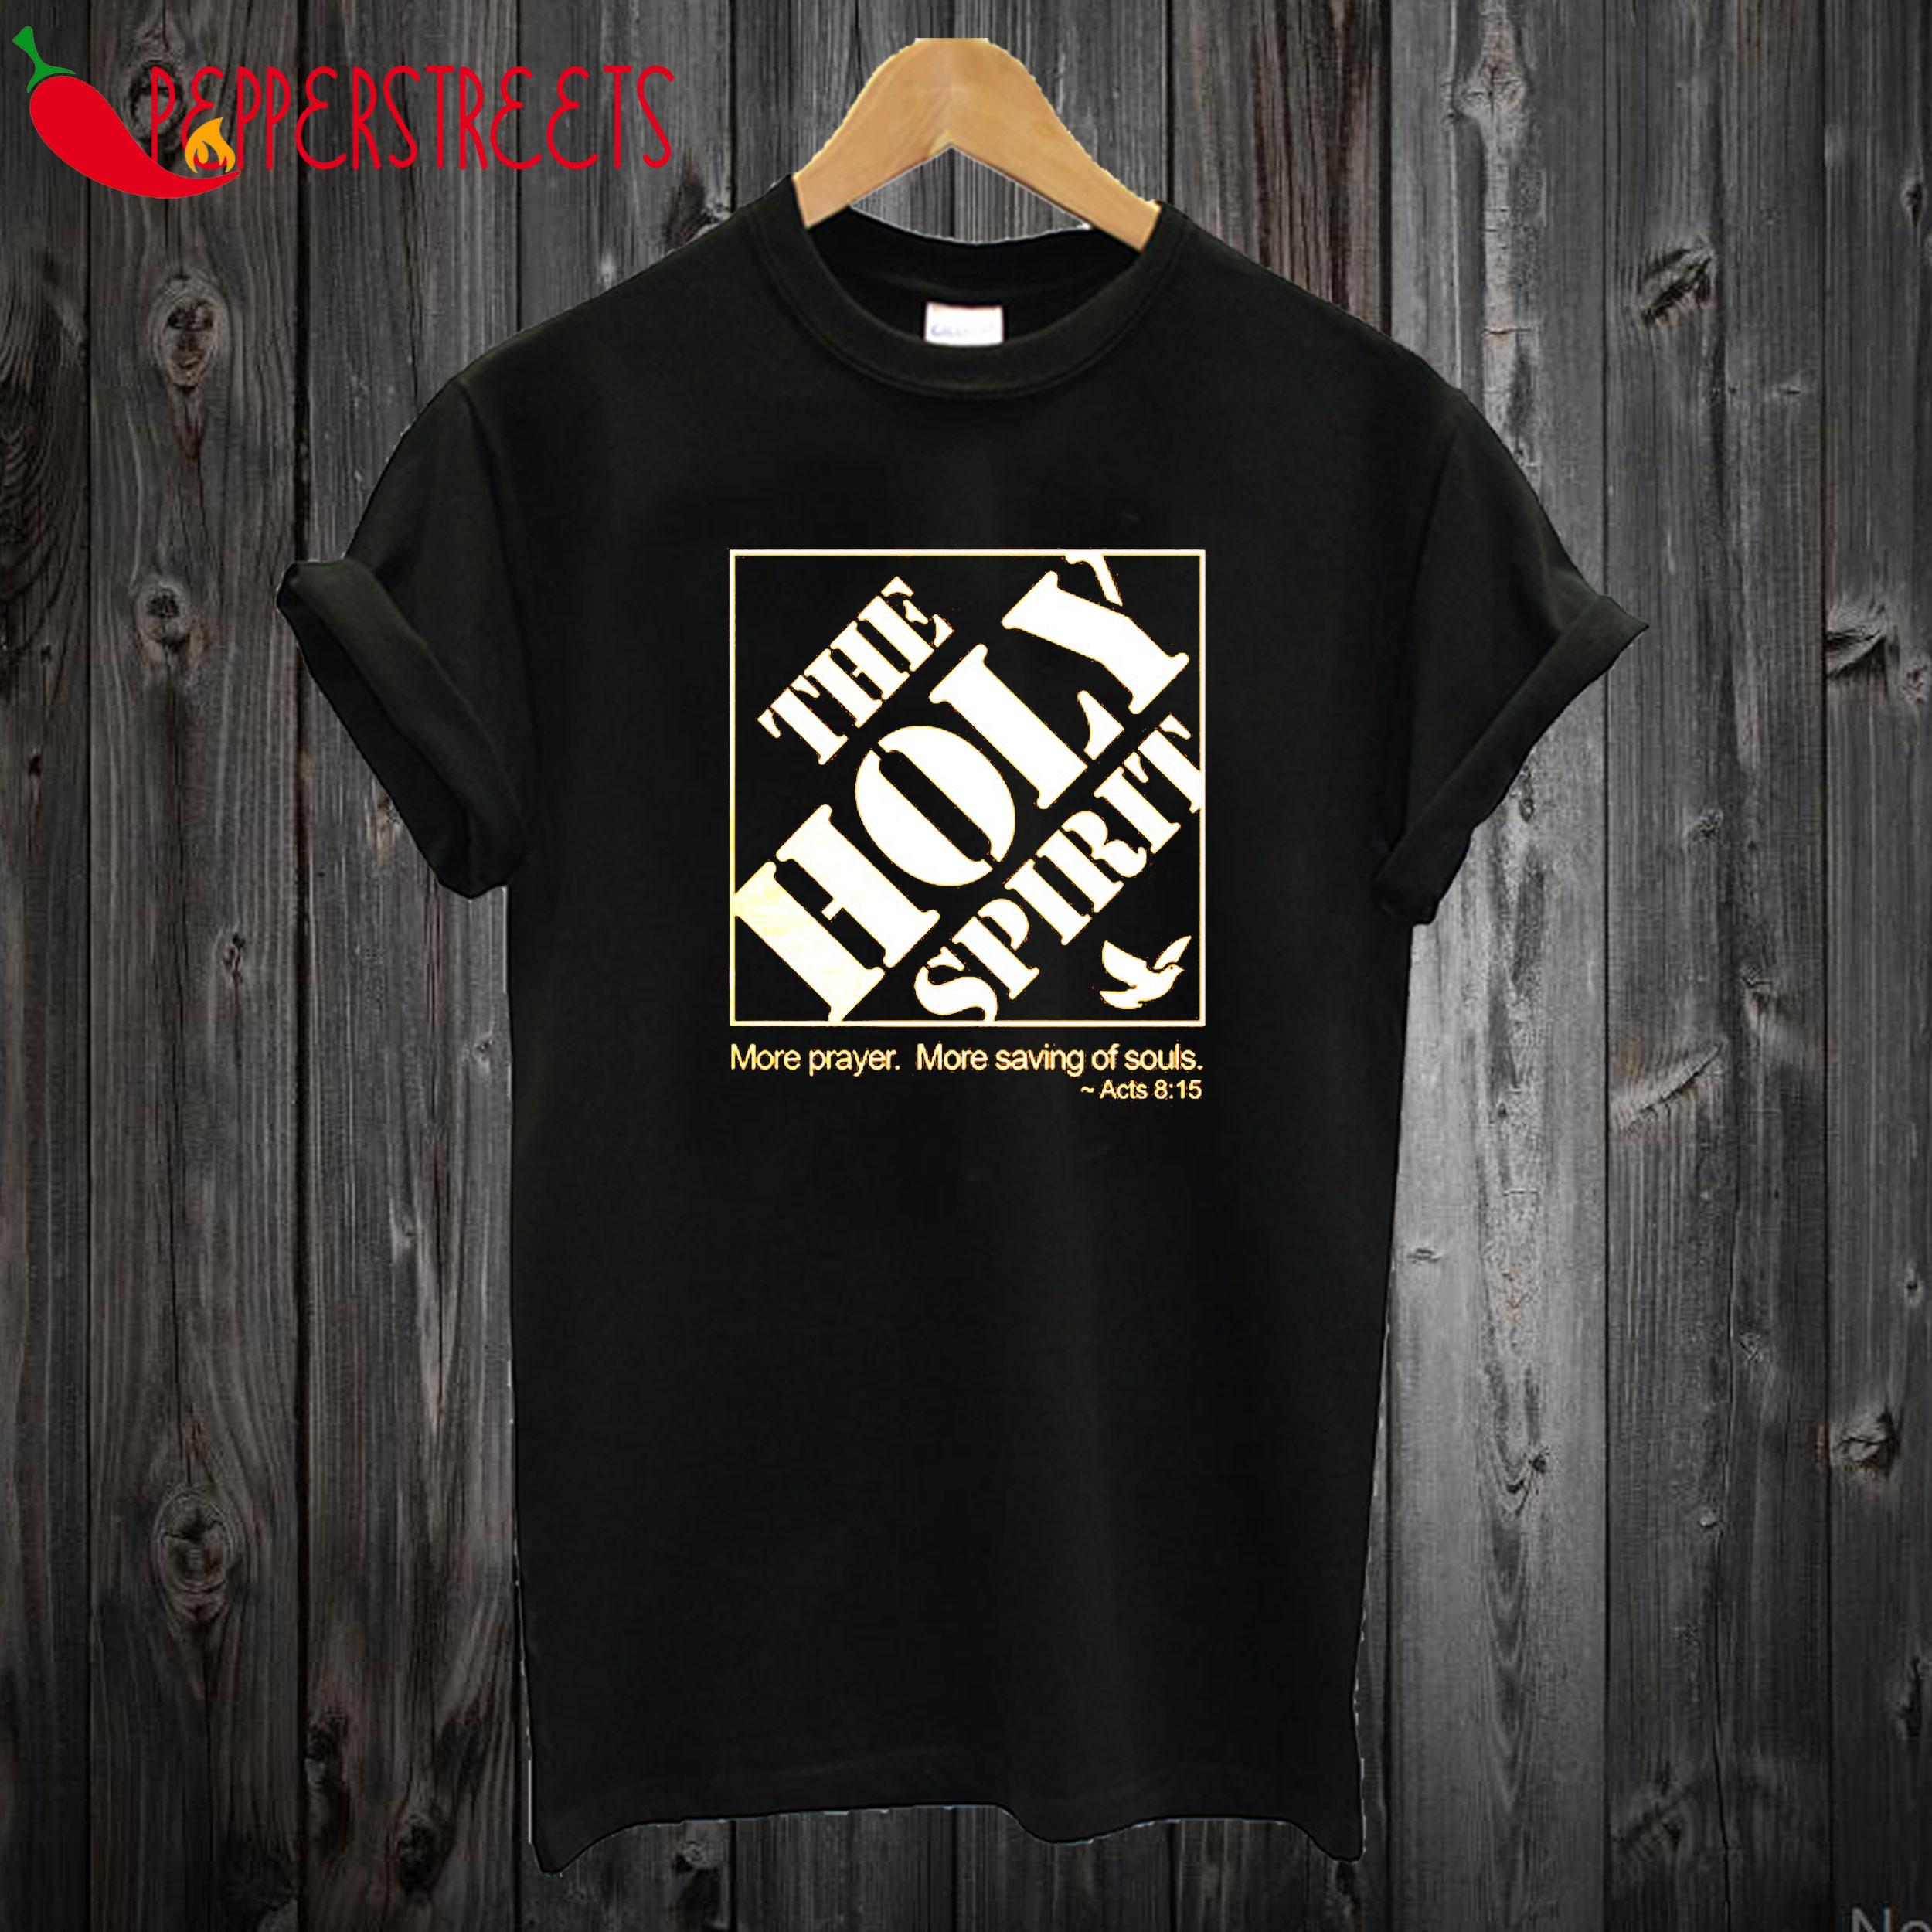 The Holy Spirit T shirt